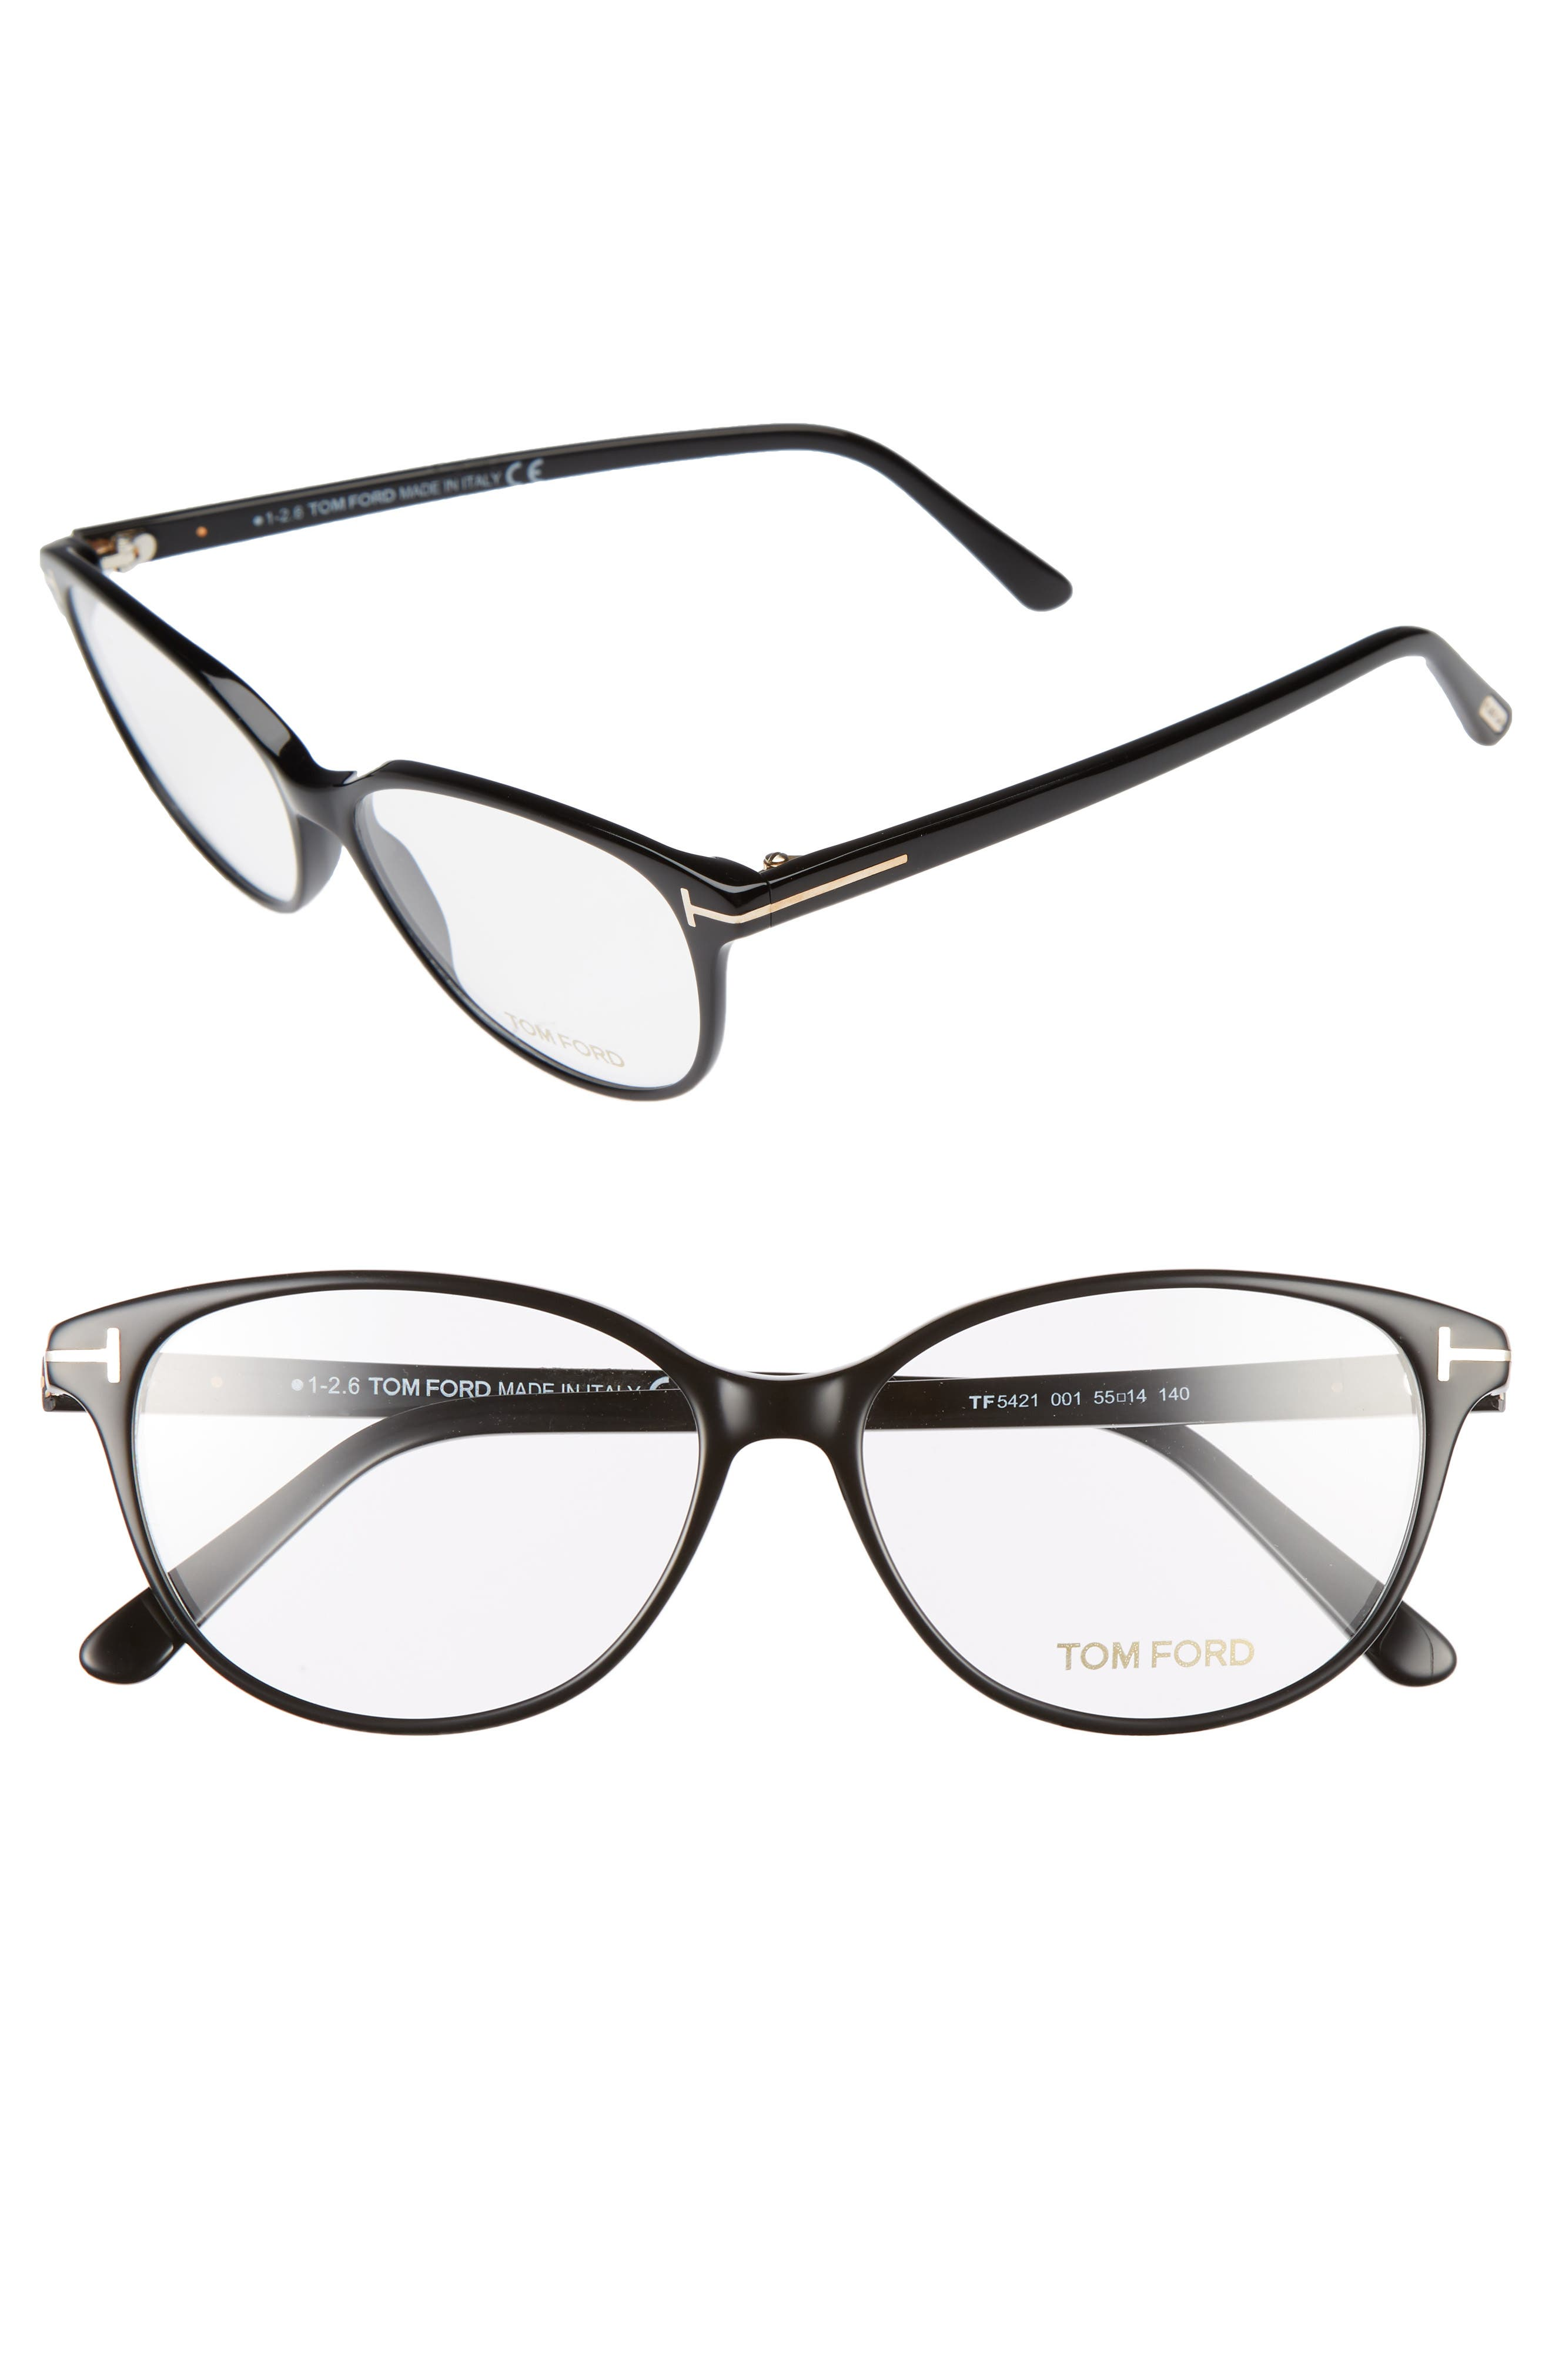 Tom Ford 55mm Optical Glasses